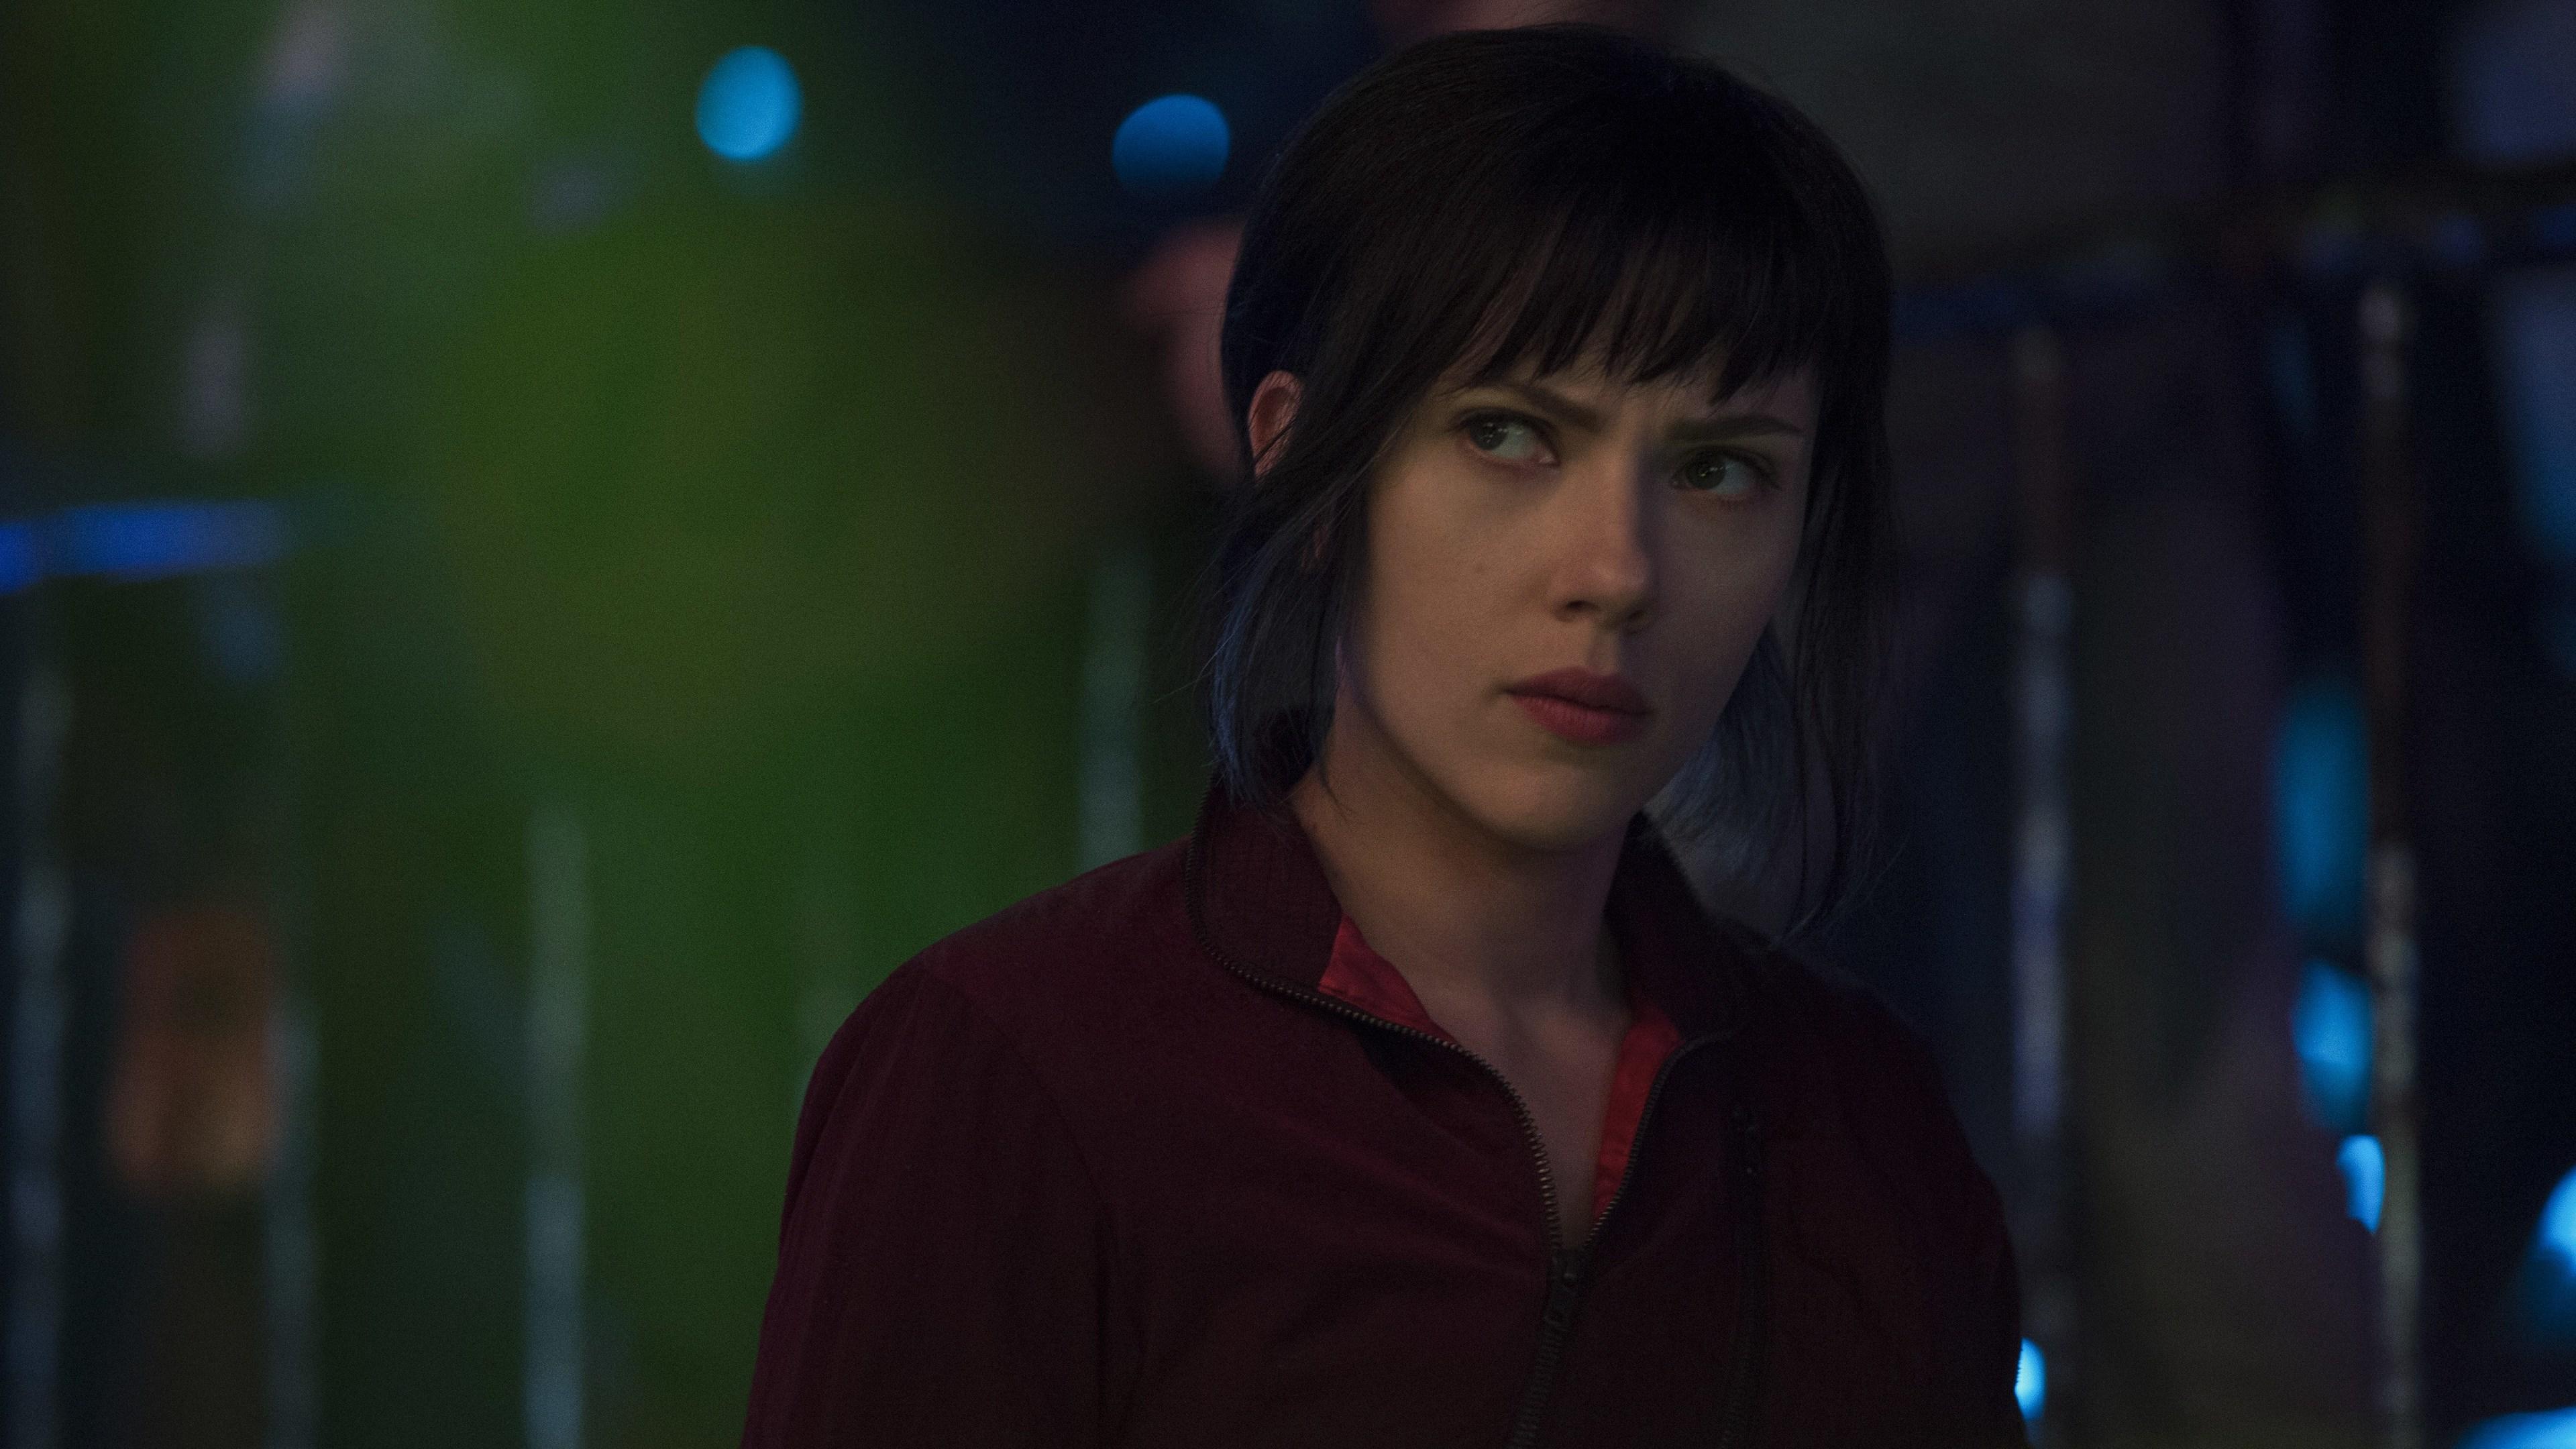 Wallpaper 4k Scarlett Johansson As Major Ghost In Shell 2017 2017